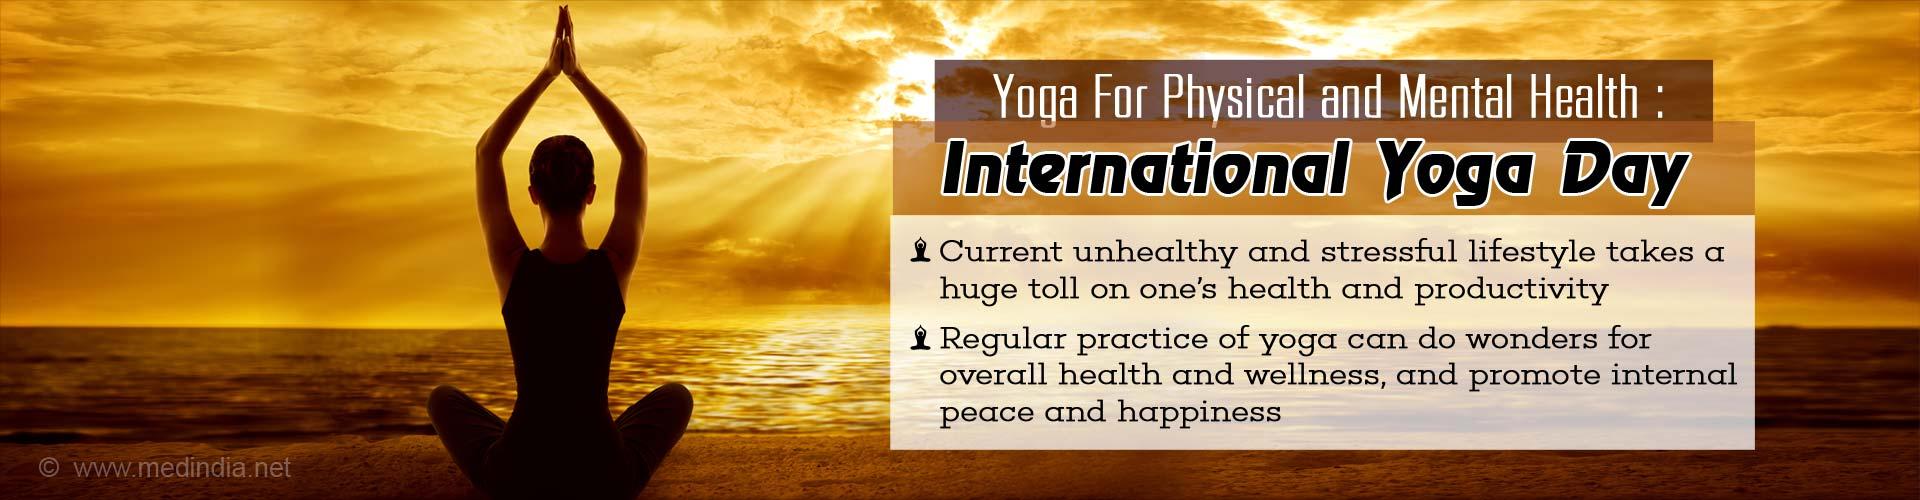 International Yoga Day �